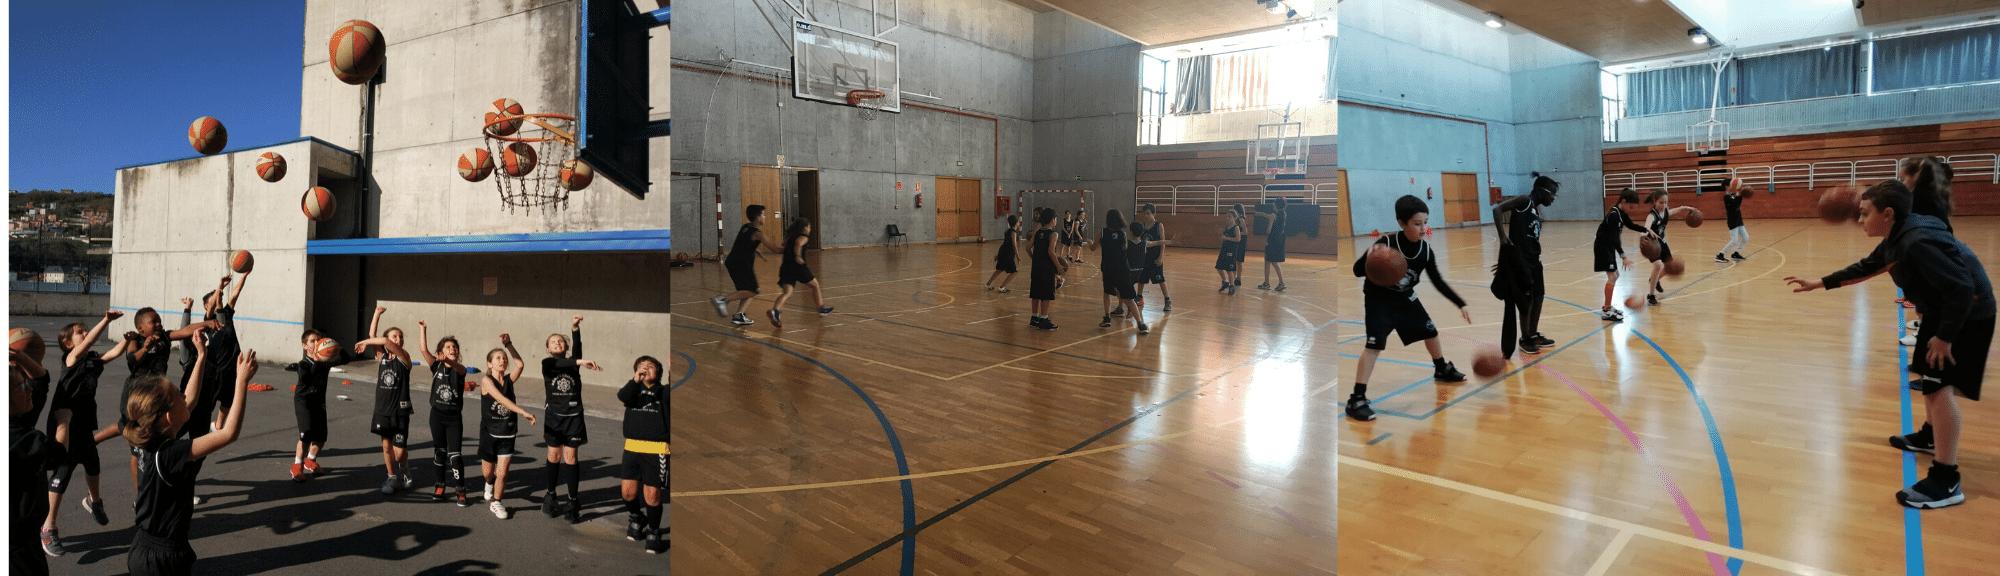 Minibasket en La Salle